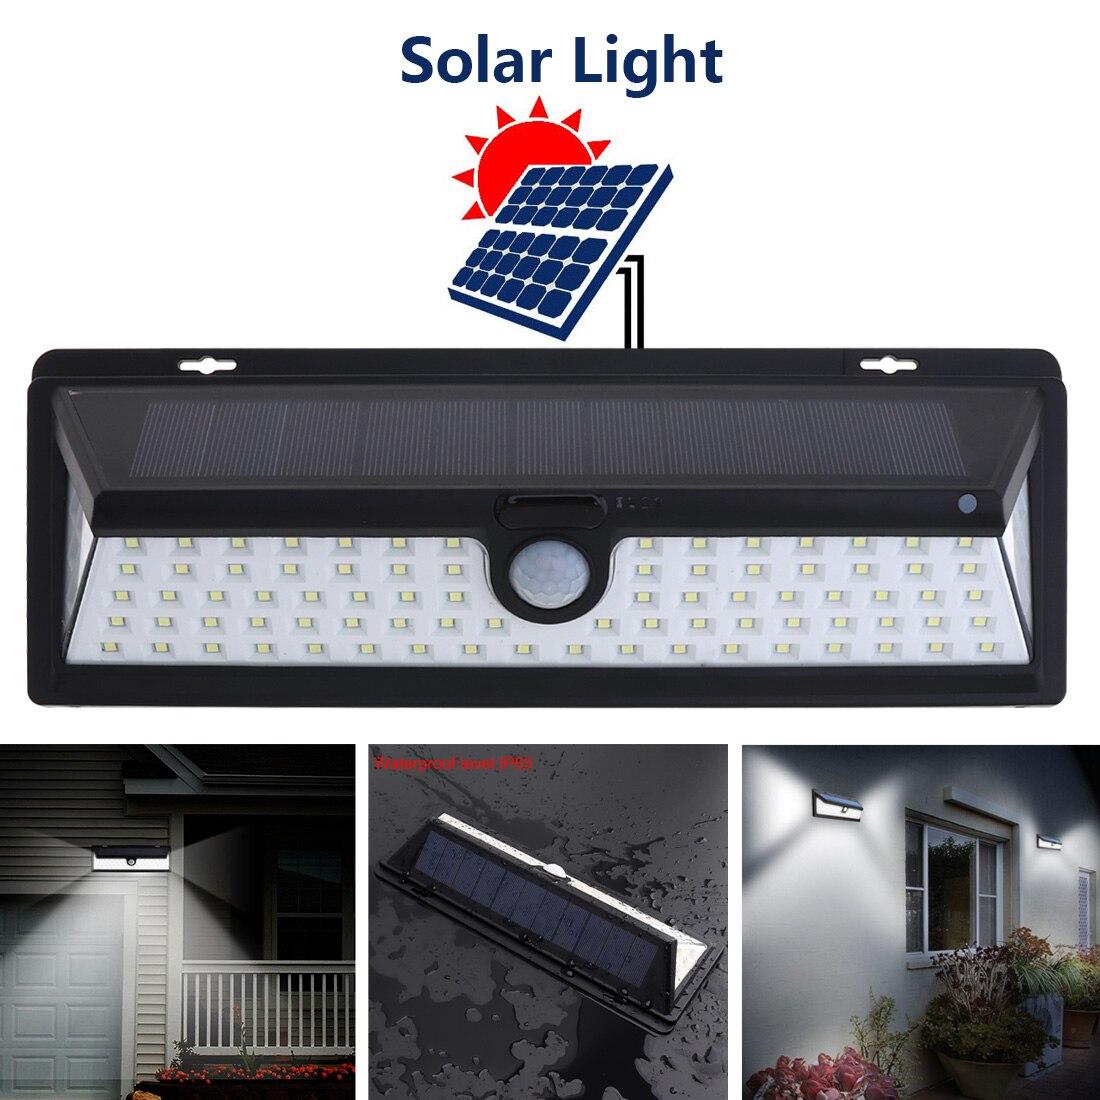 Waterproof 90 LED 2835 SMD White Solar Power PIR Motion Sensor Wall Light Outdoor Garden Light with 3 Different Lighting Modes